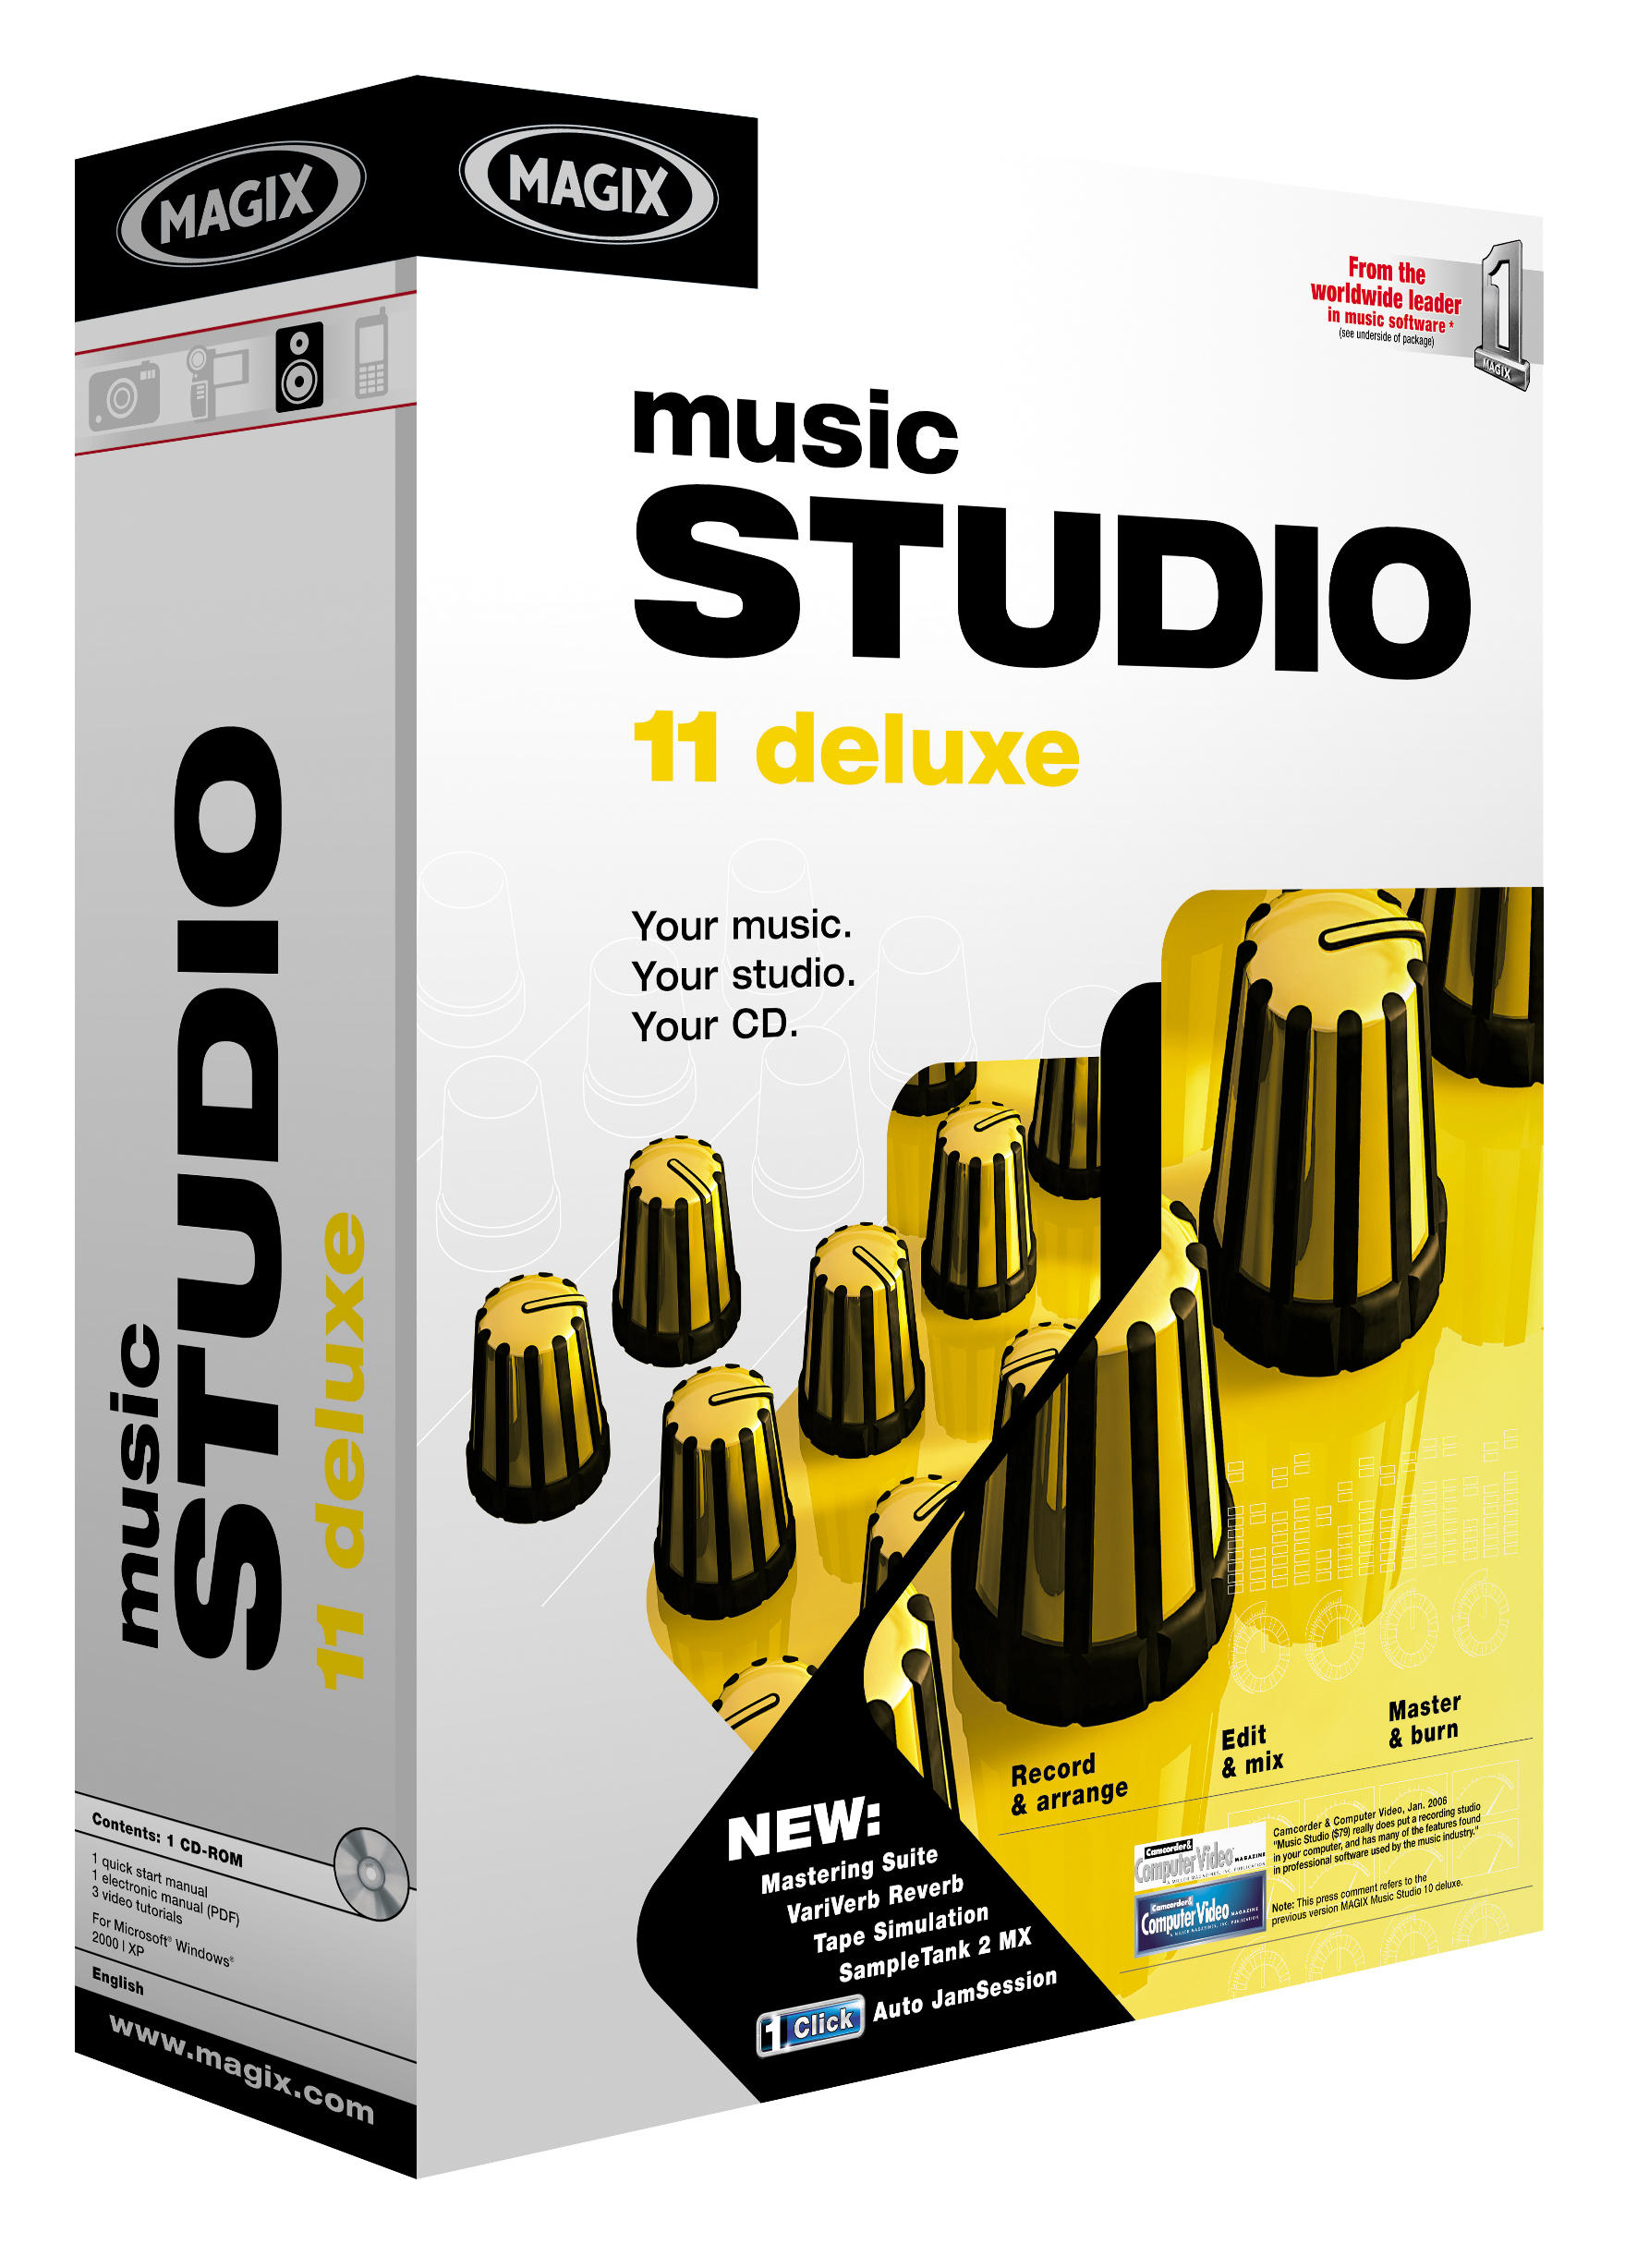 Magix Introduces Music Studio 11 Deluxe Planet Musician